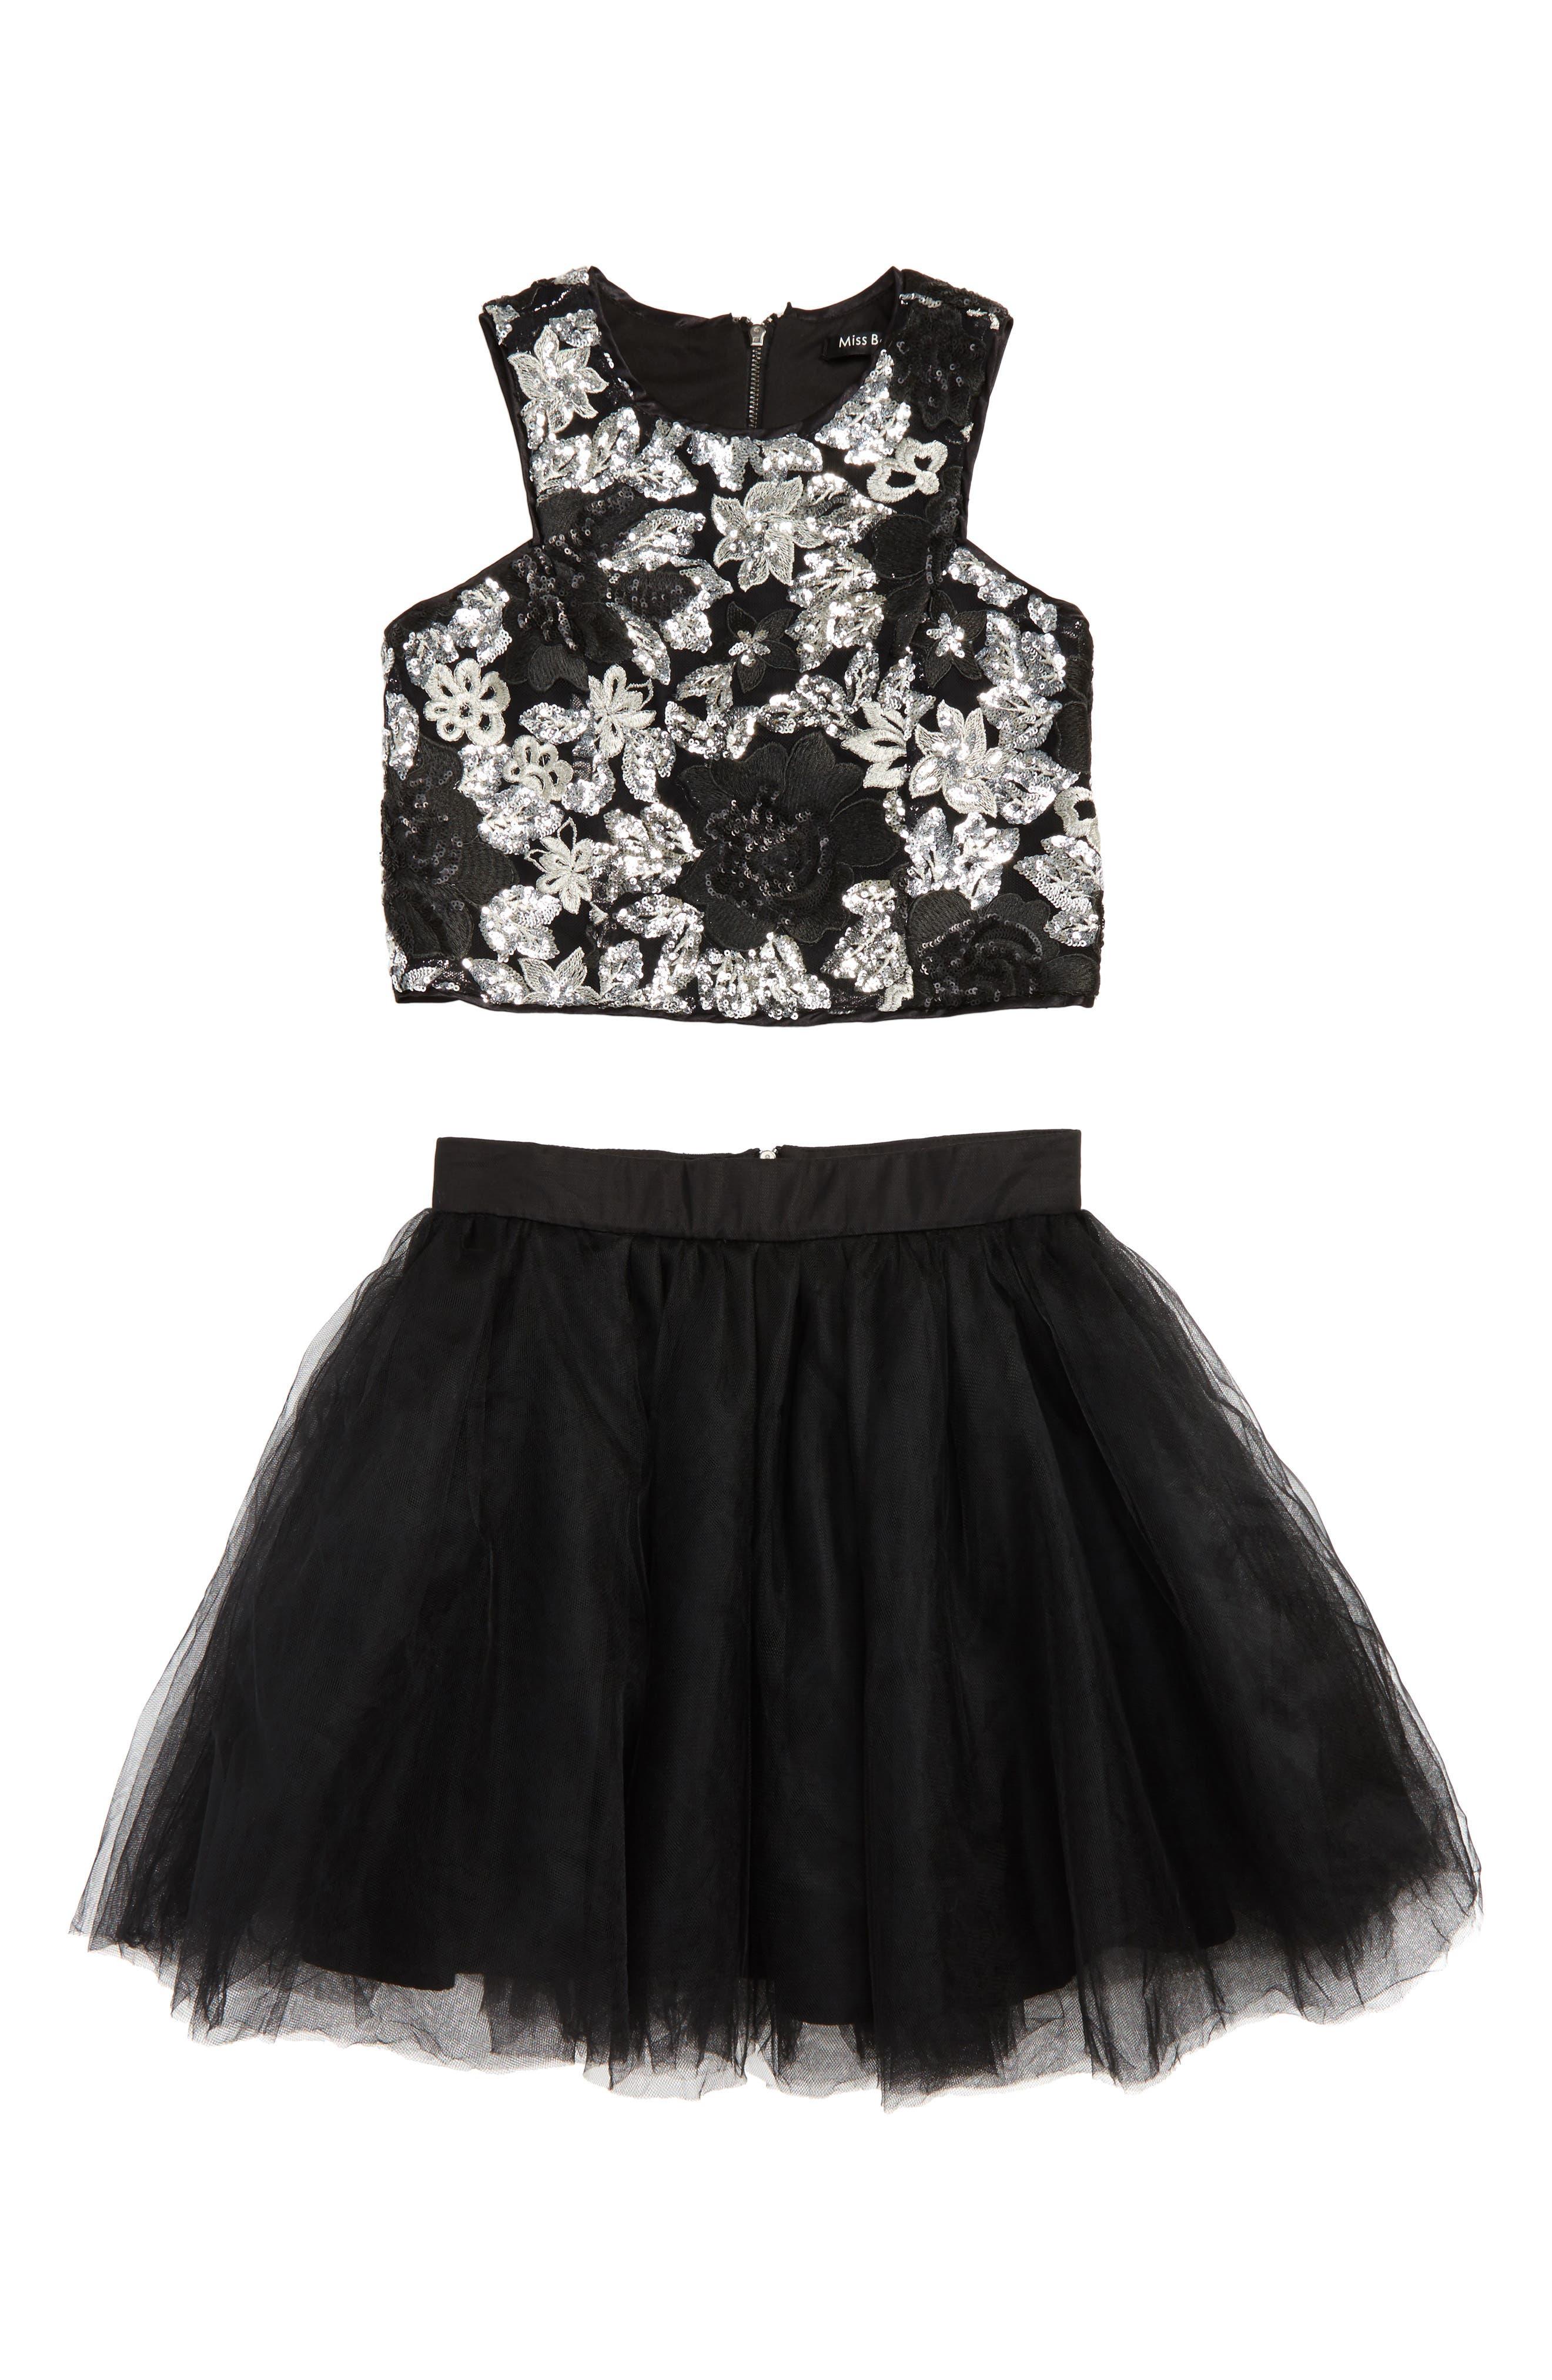 Main Image - Miss Behave Shirley Meet & Greet Sequin Crop Top & Tulle Skirt (Big Girls)